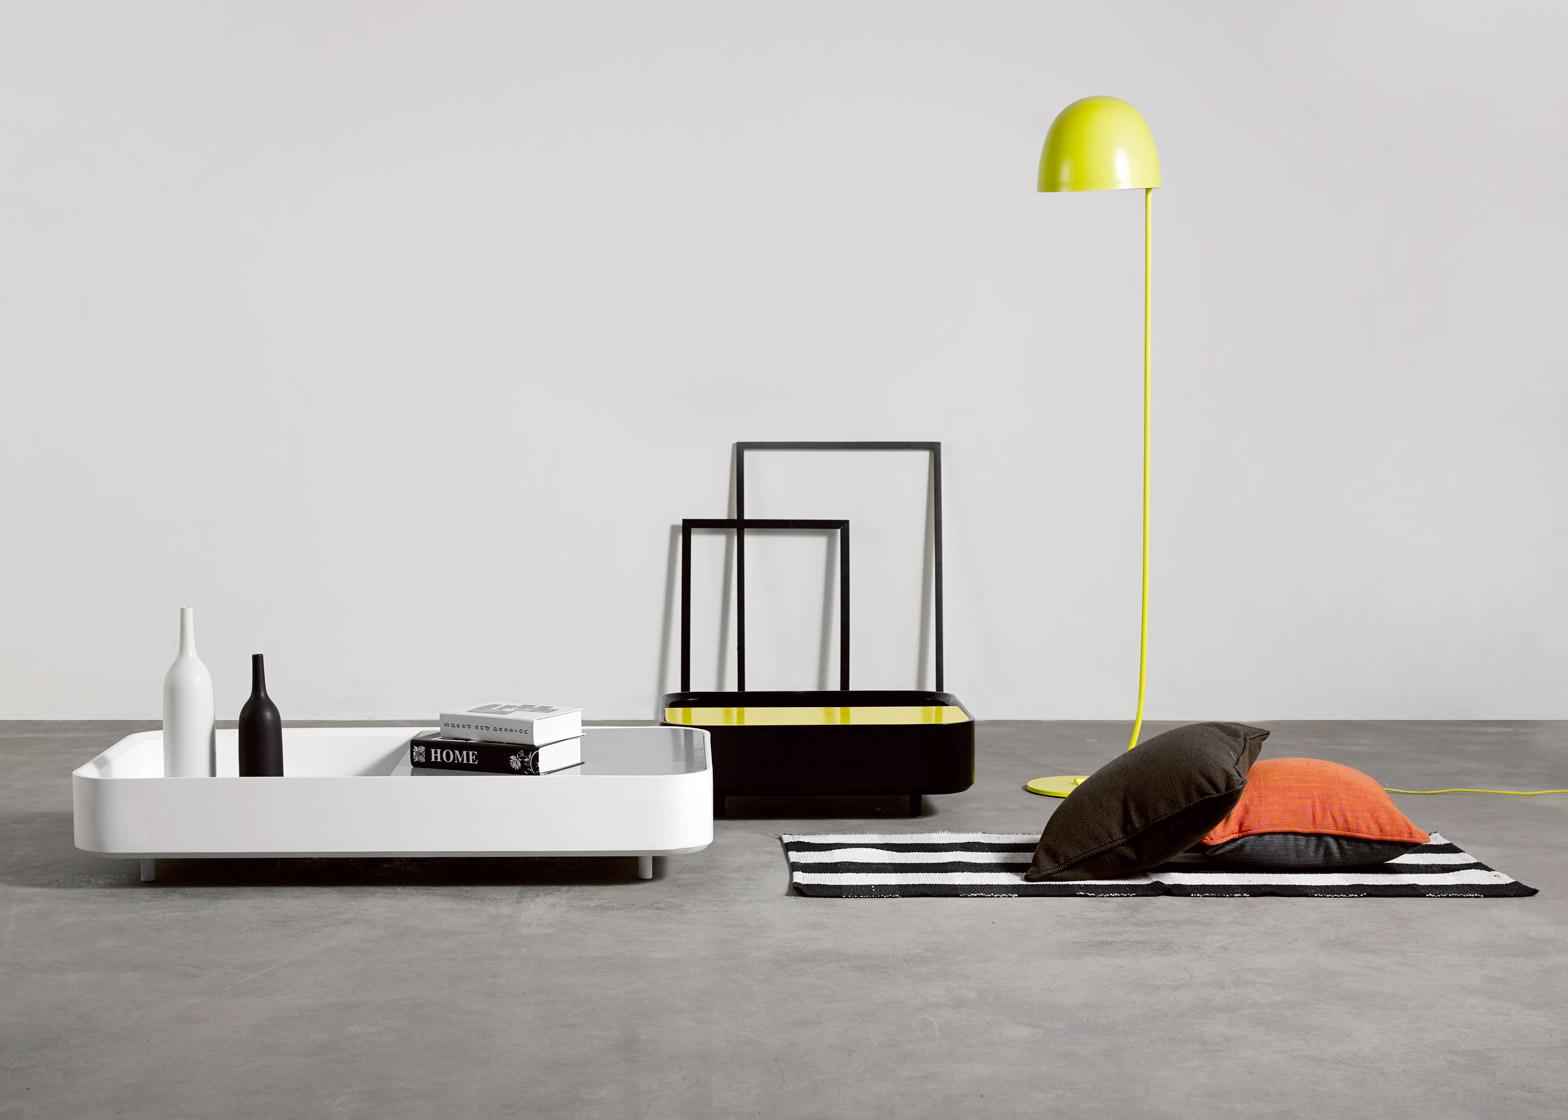 Tinbox by Luca Nichetto